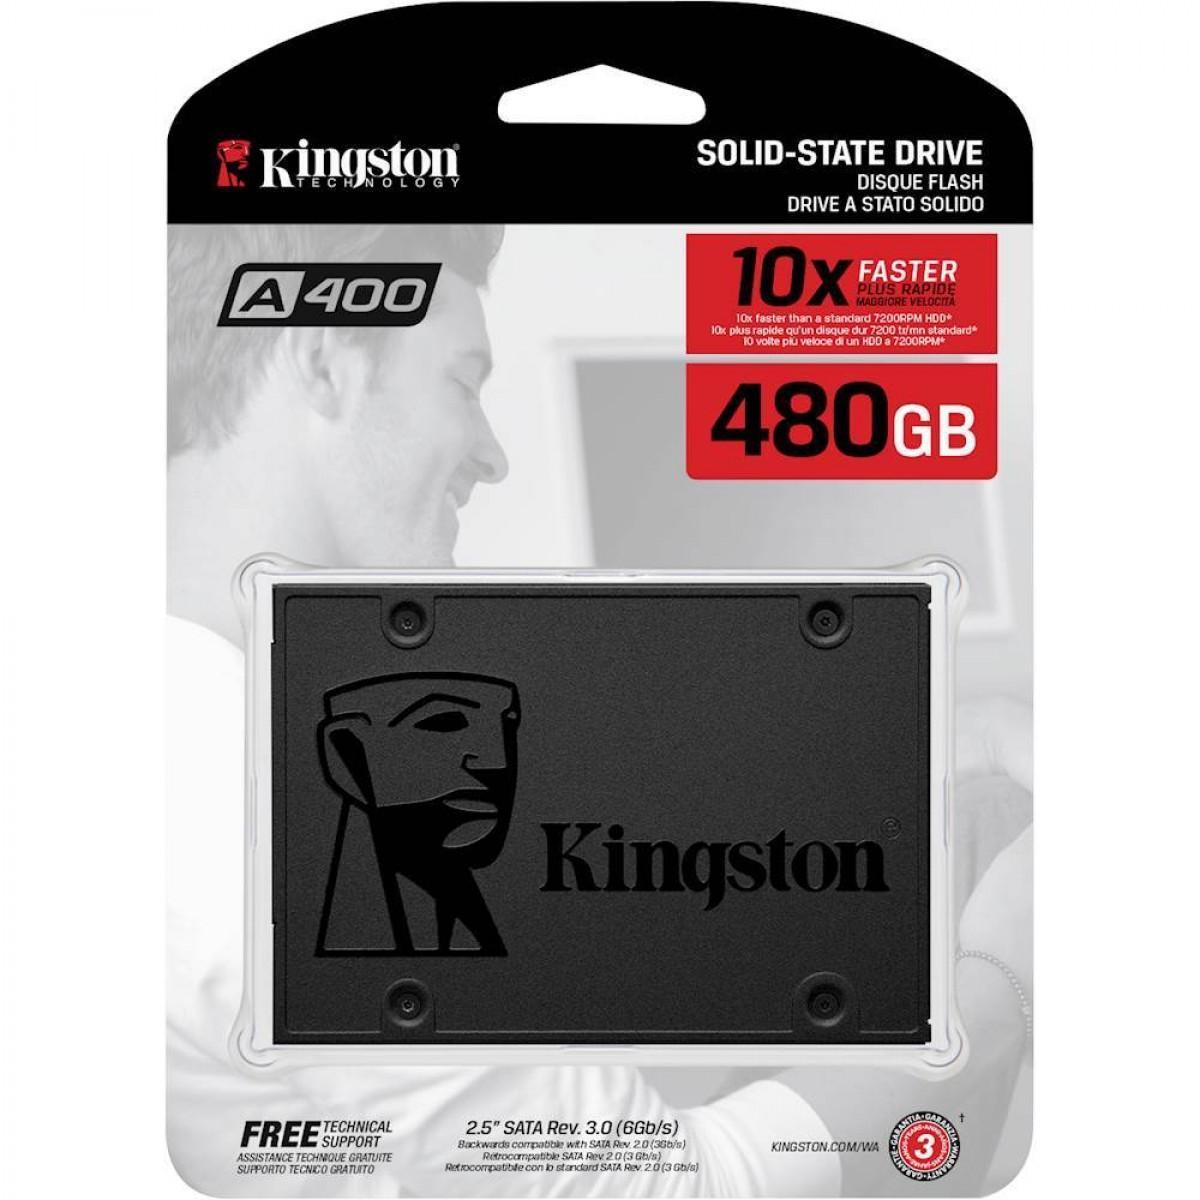 Kingston A400 480GB SSD - SSD A400